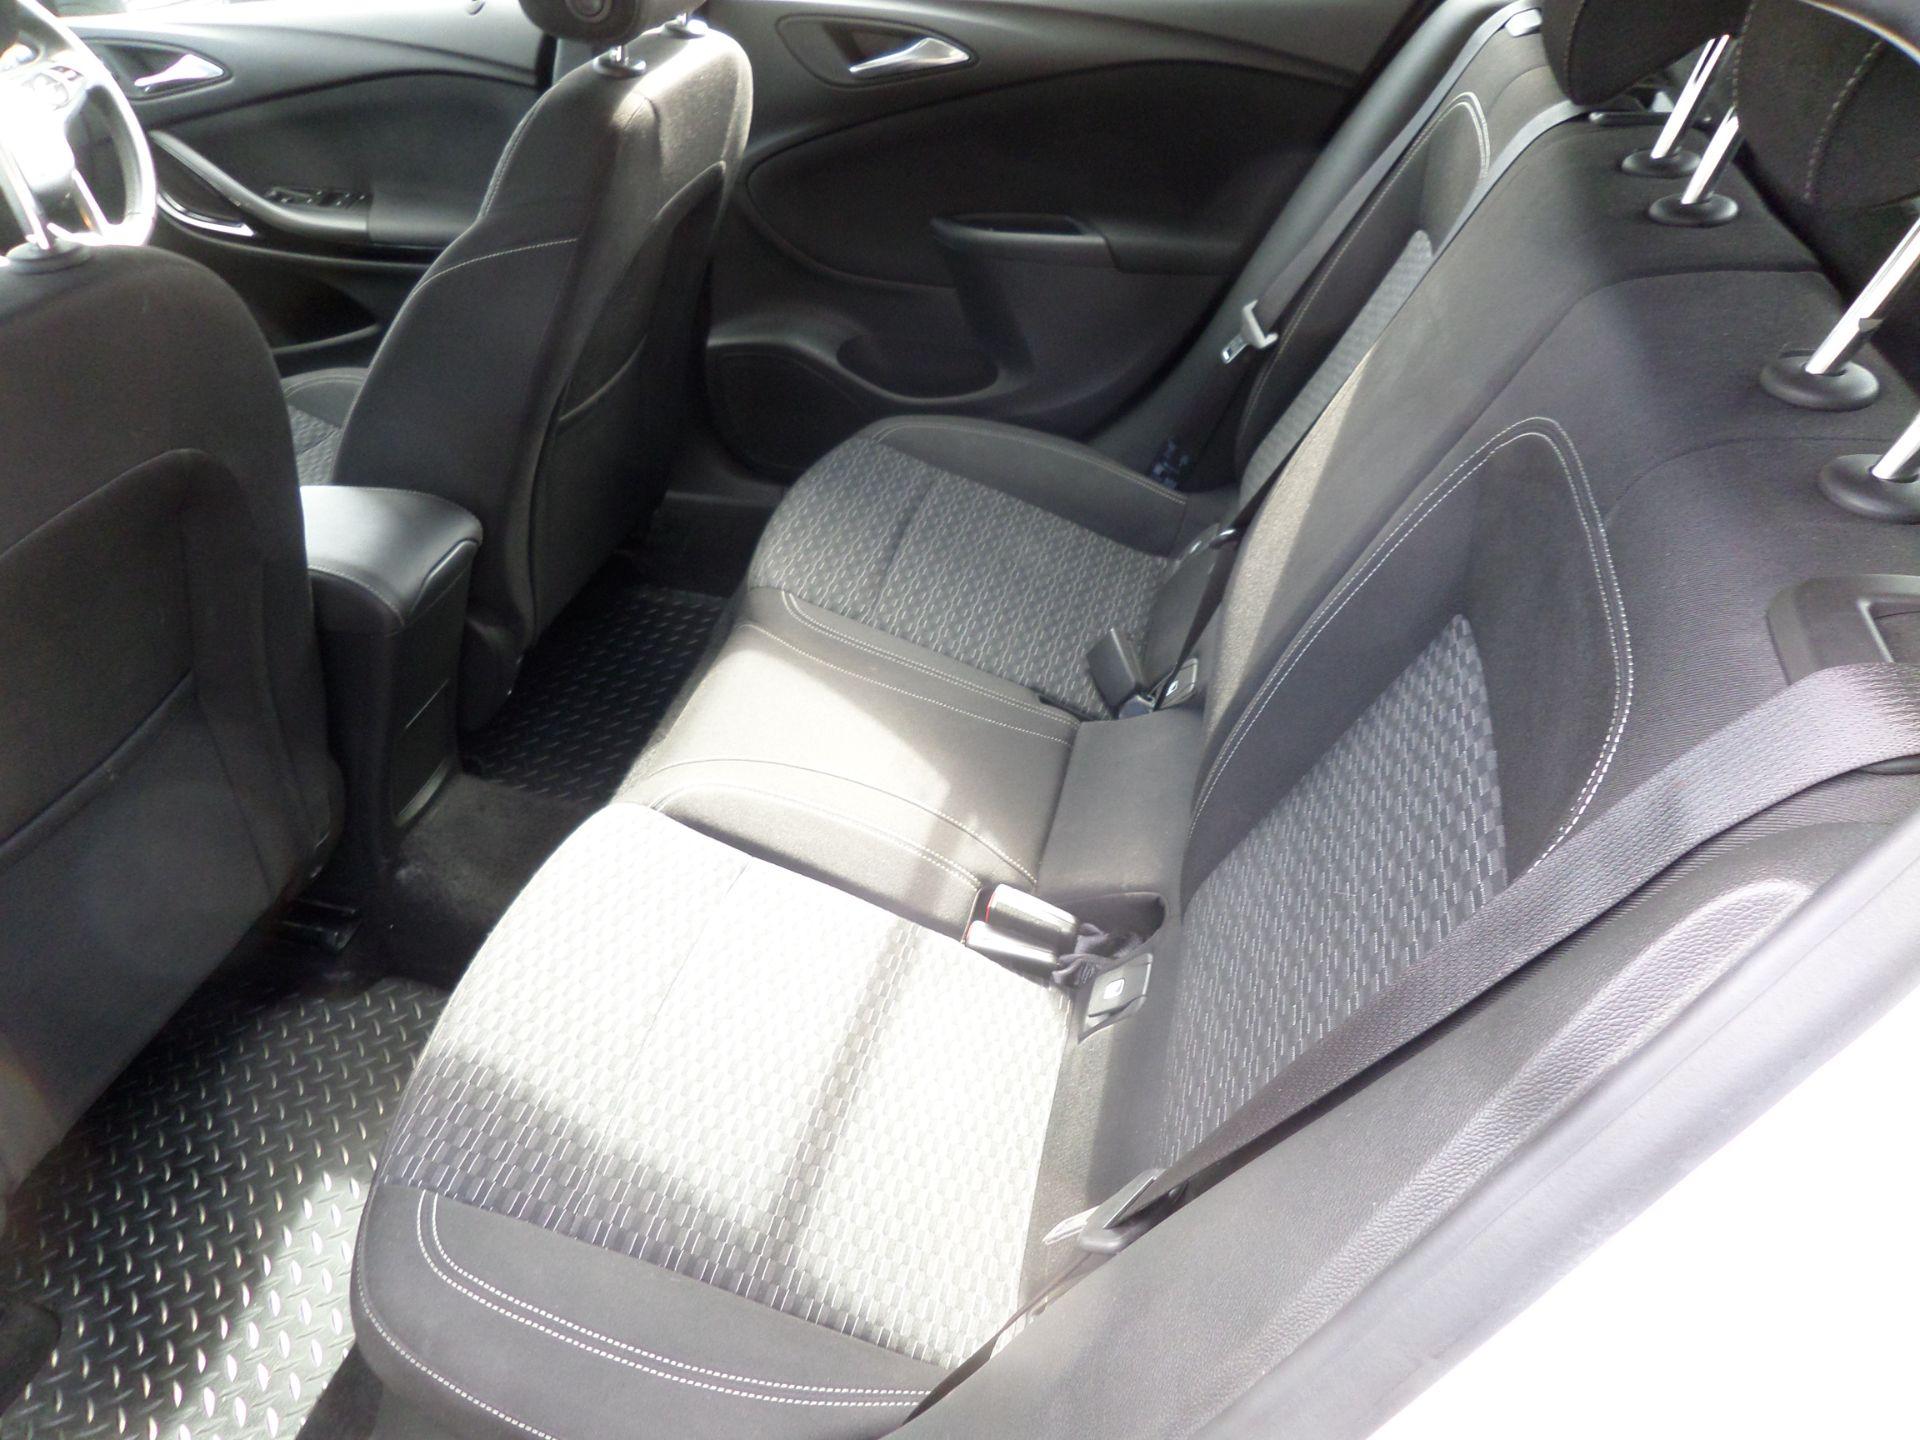 2018 Vauxhall Astra 1.6 Cdti 16V 136 Sri Nav 5Dr Euro 6 (DP18VCN) Image 7